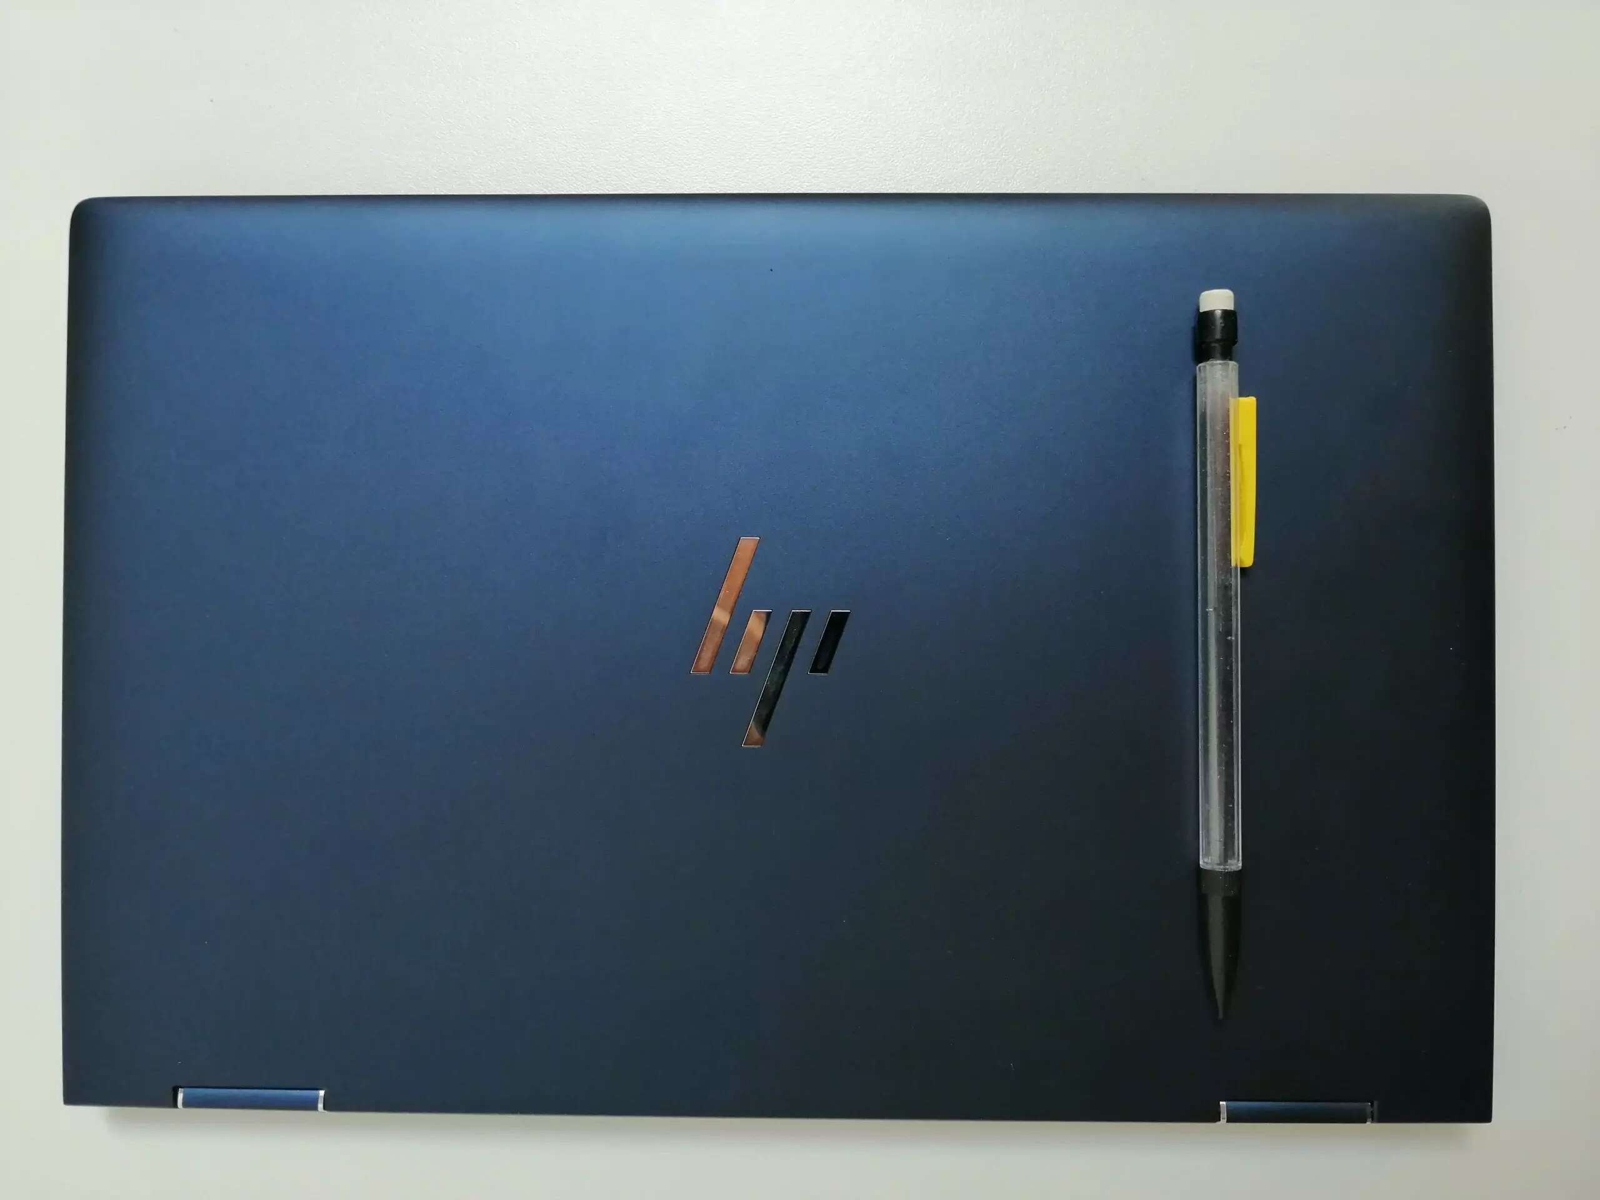 HP elite dragonfly - comparaison crayon